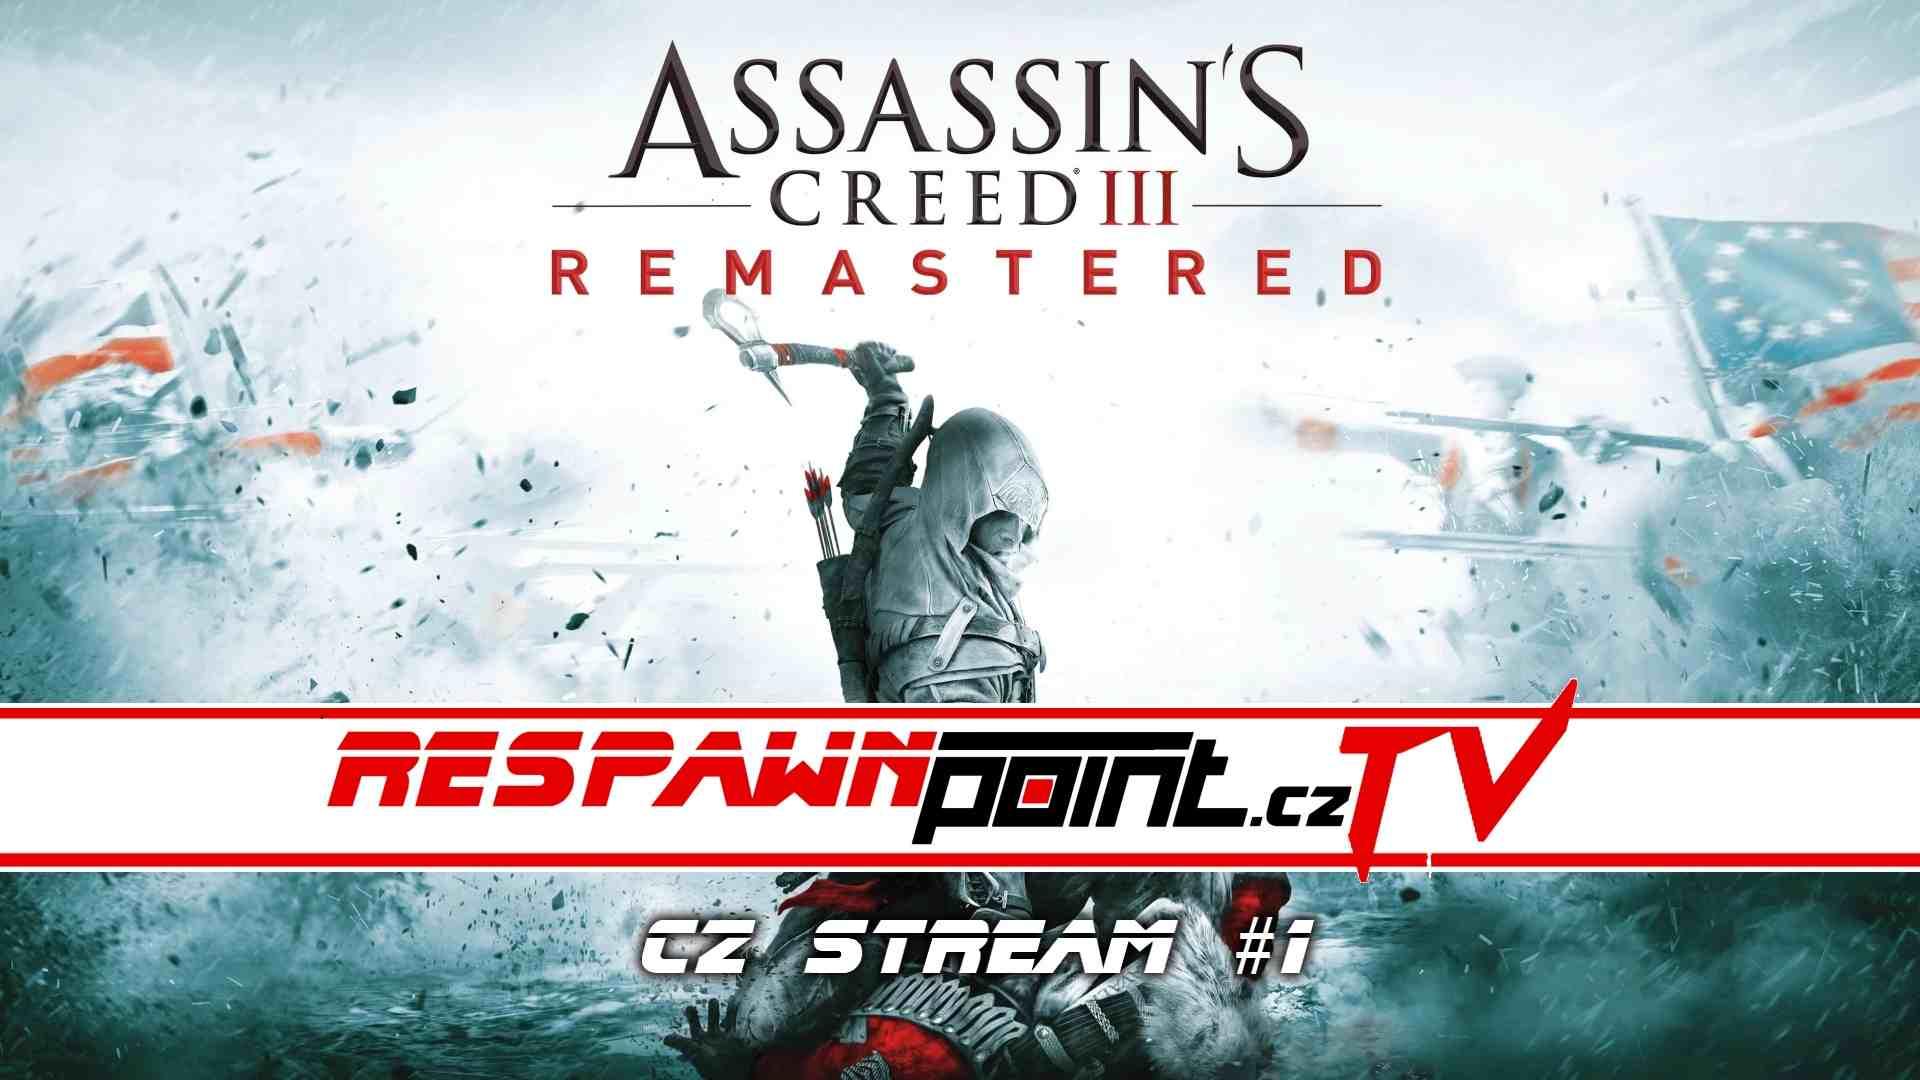 Assassins Creed 3 Remastered – CZ stream #1